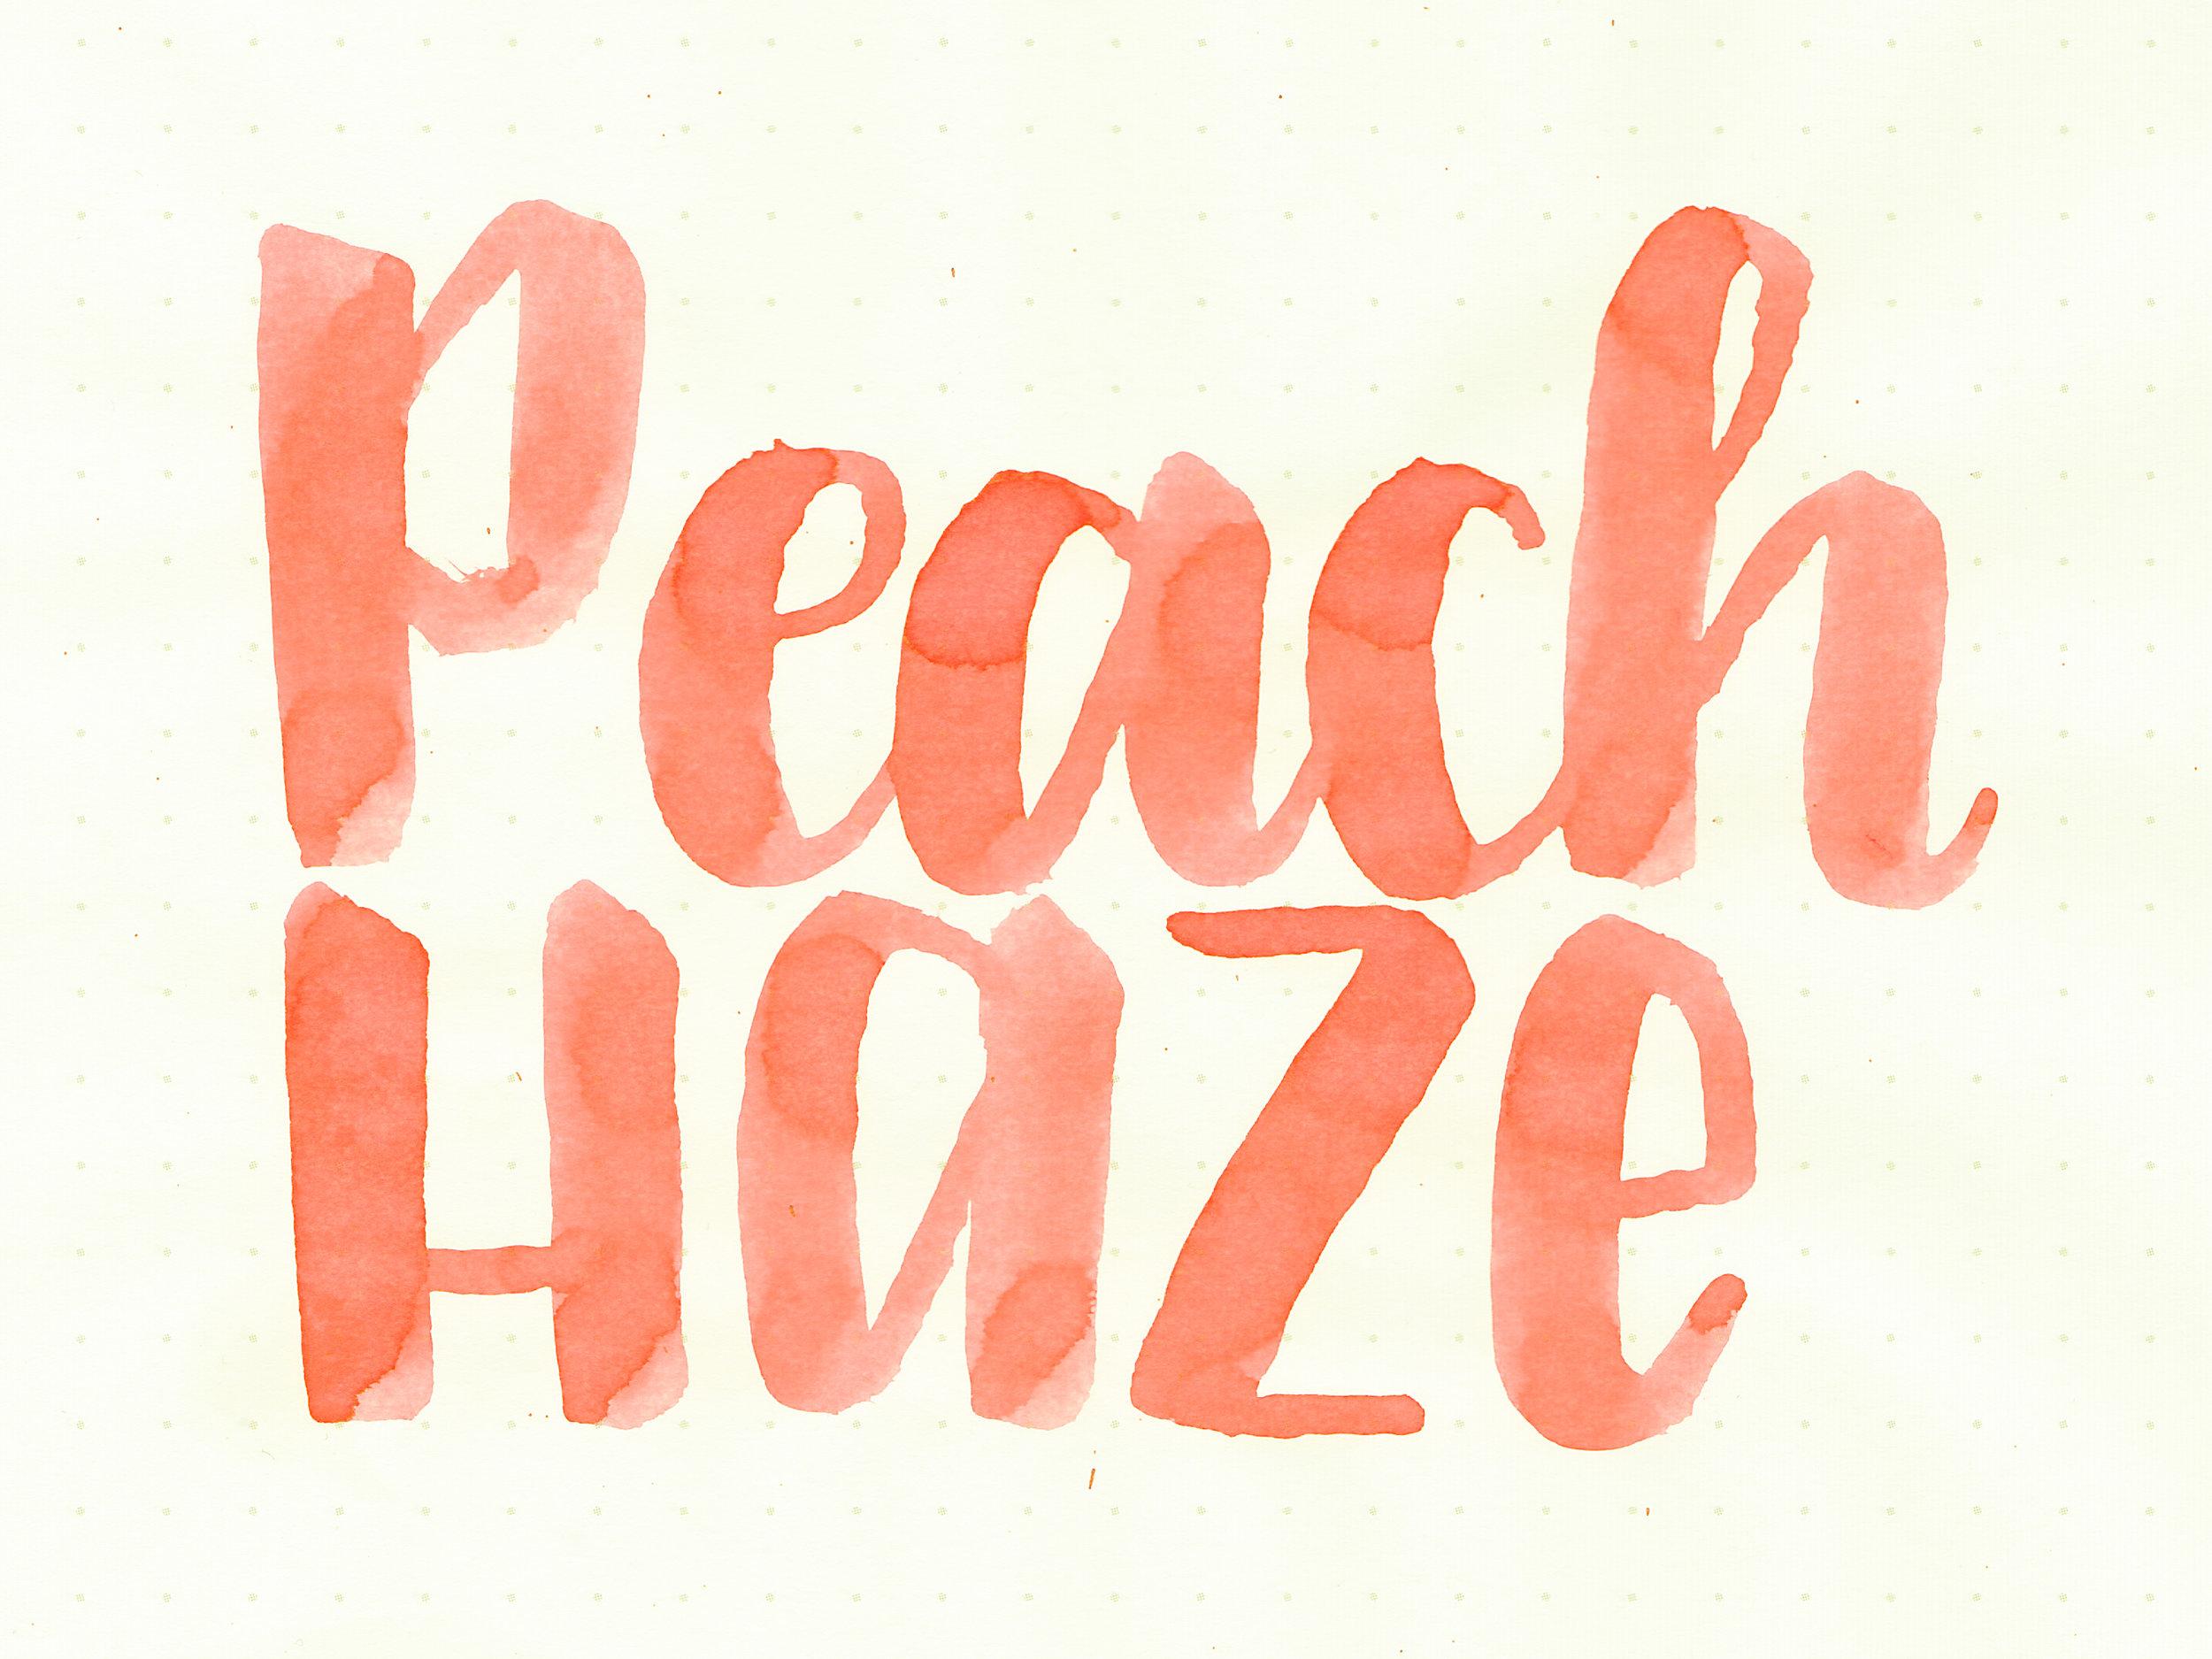 d-peach-haze-4.jpg